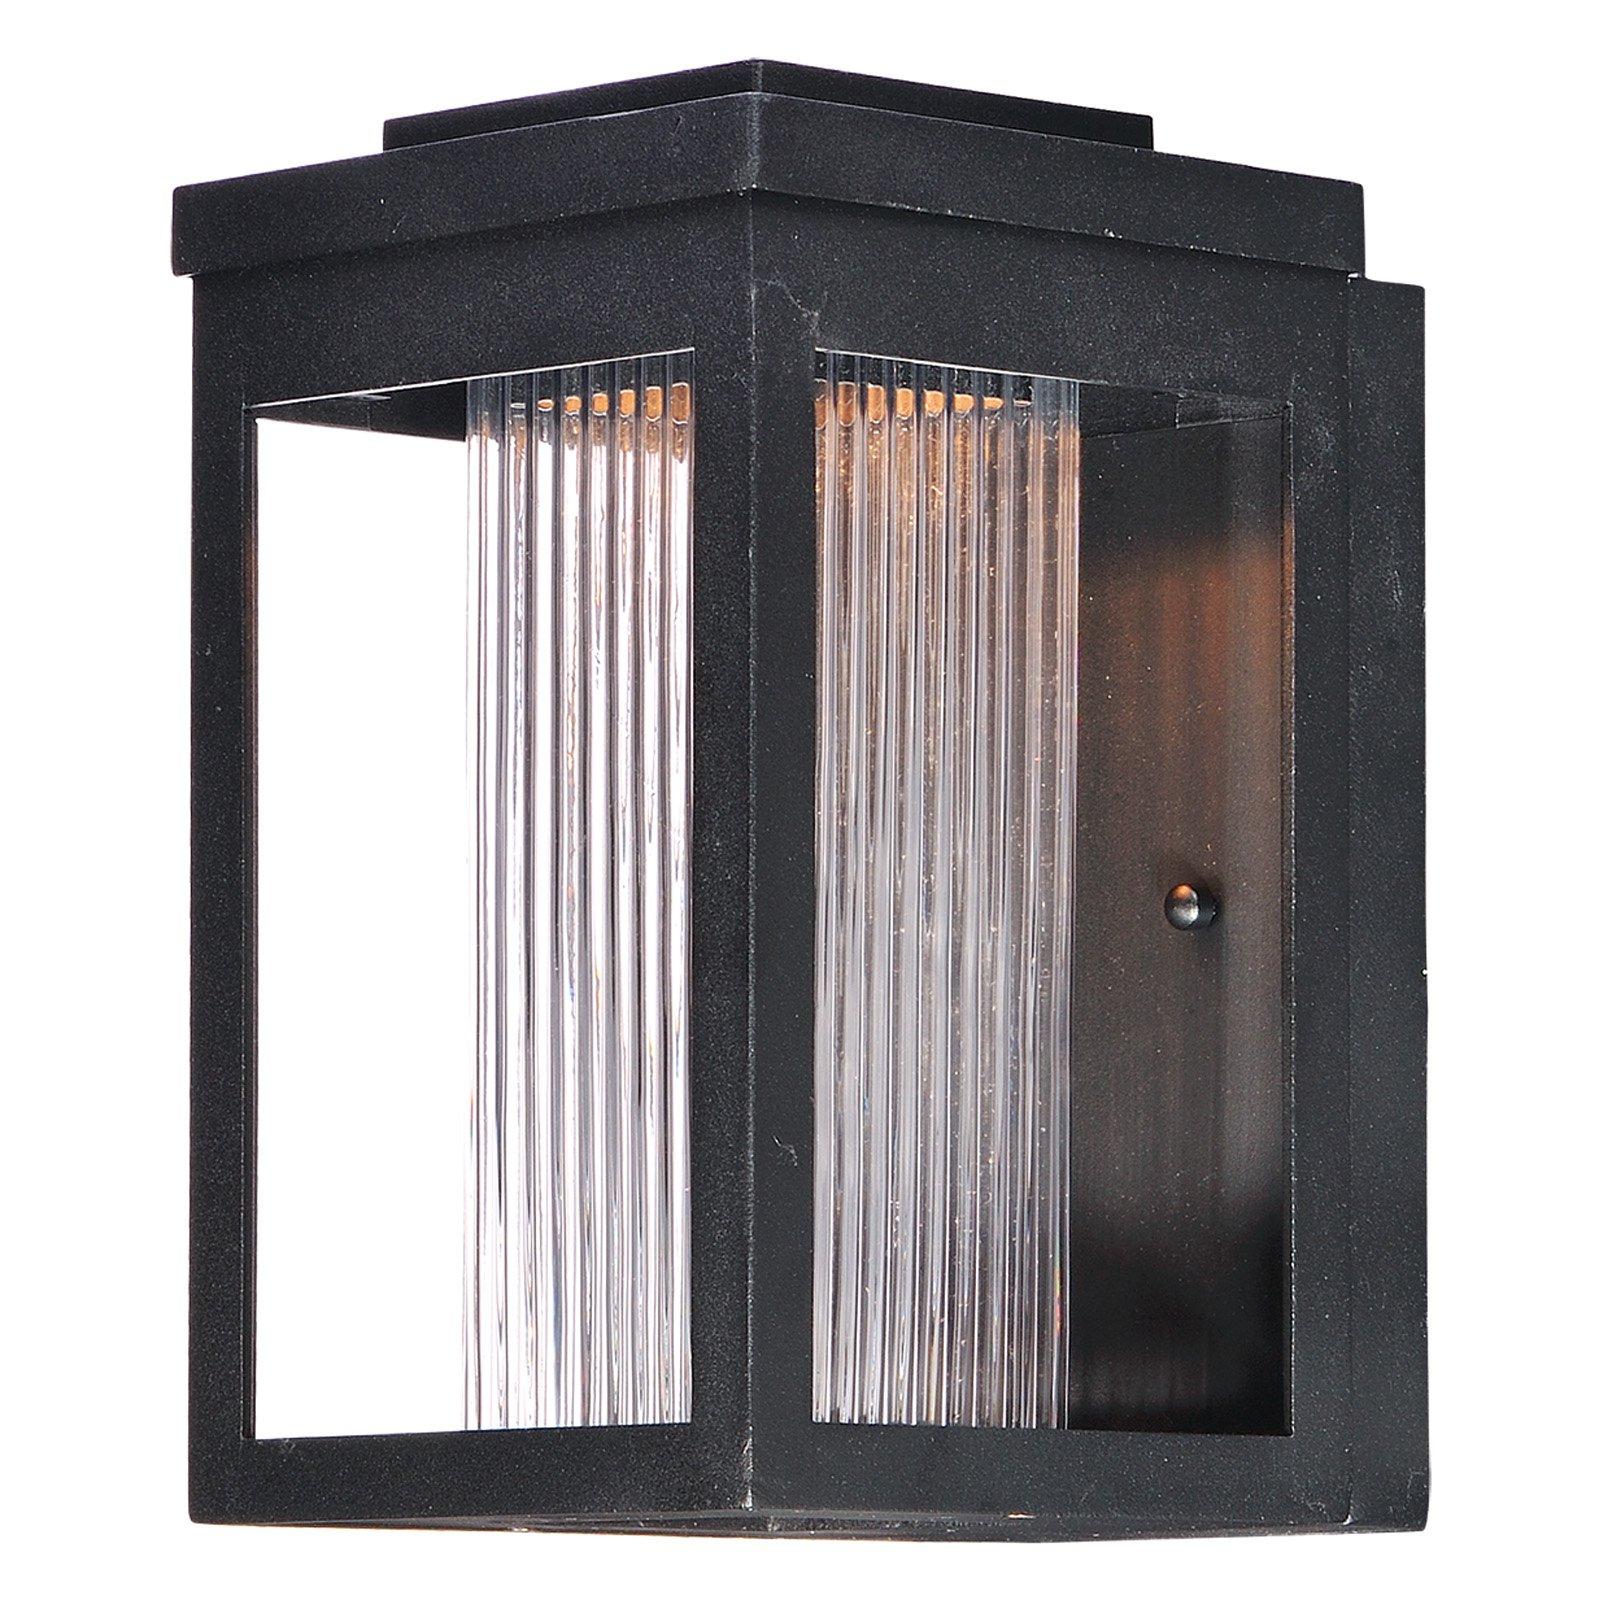 Maxim Lighting Salon 55902CRBK LED Outdoor Wall Sconce